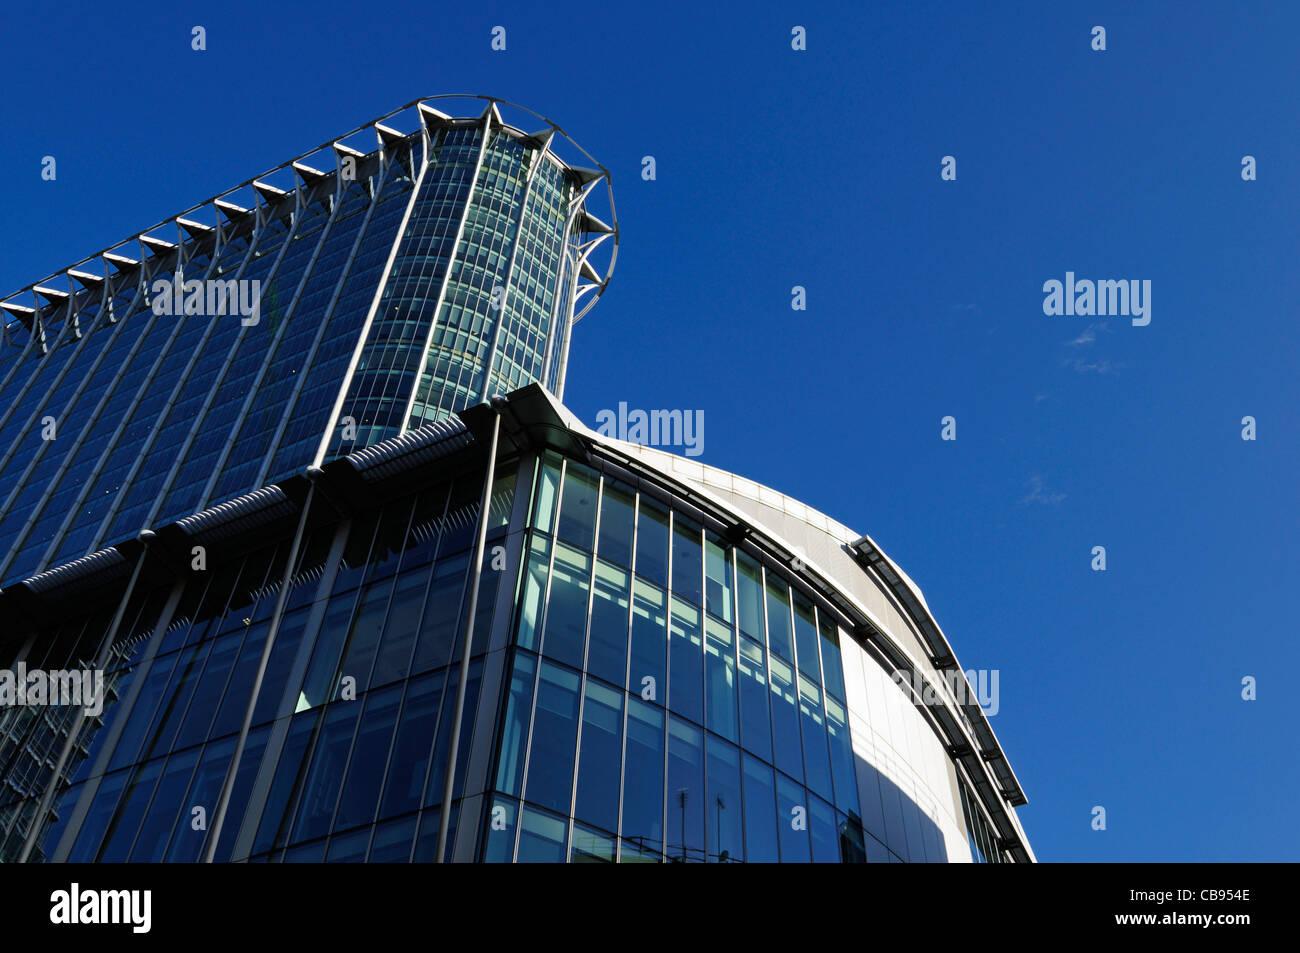 Citypoint, Ropemaker Street, Finsbury, London EC2Y, United Kingdom - Stock Image